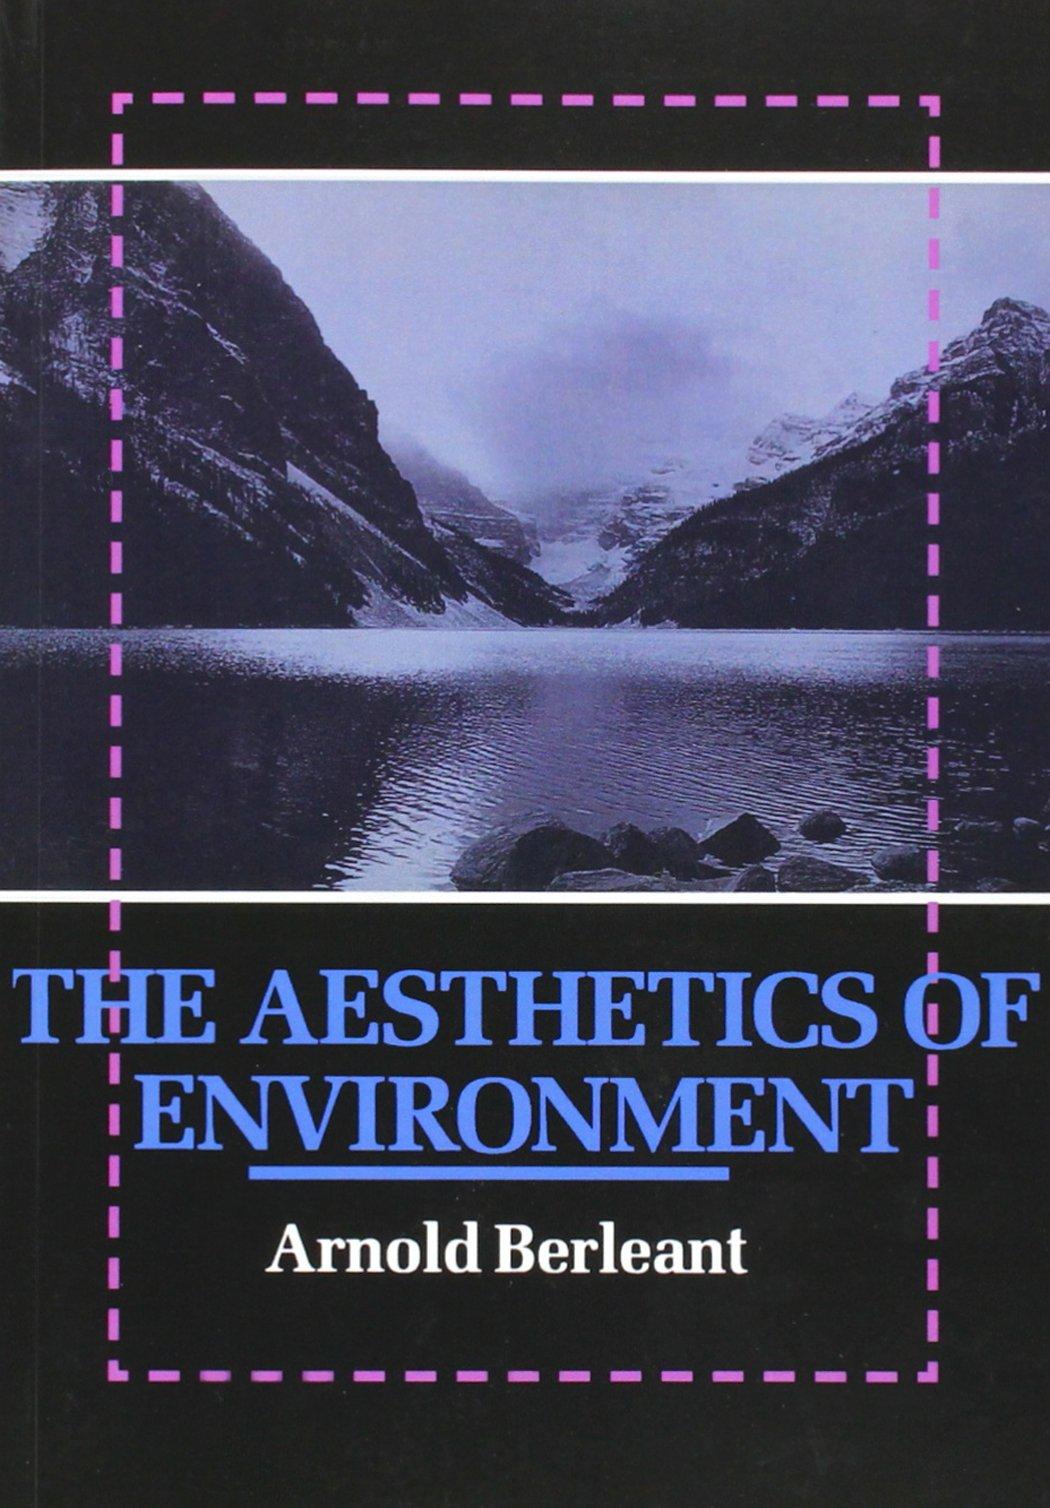 The Aesthetics of Environment